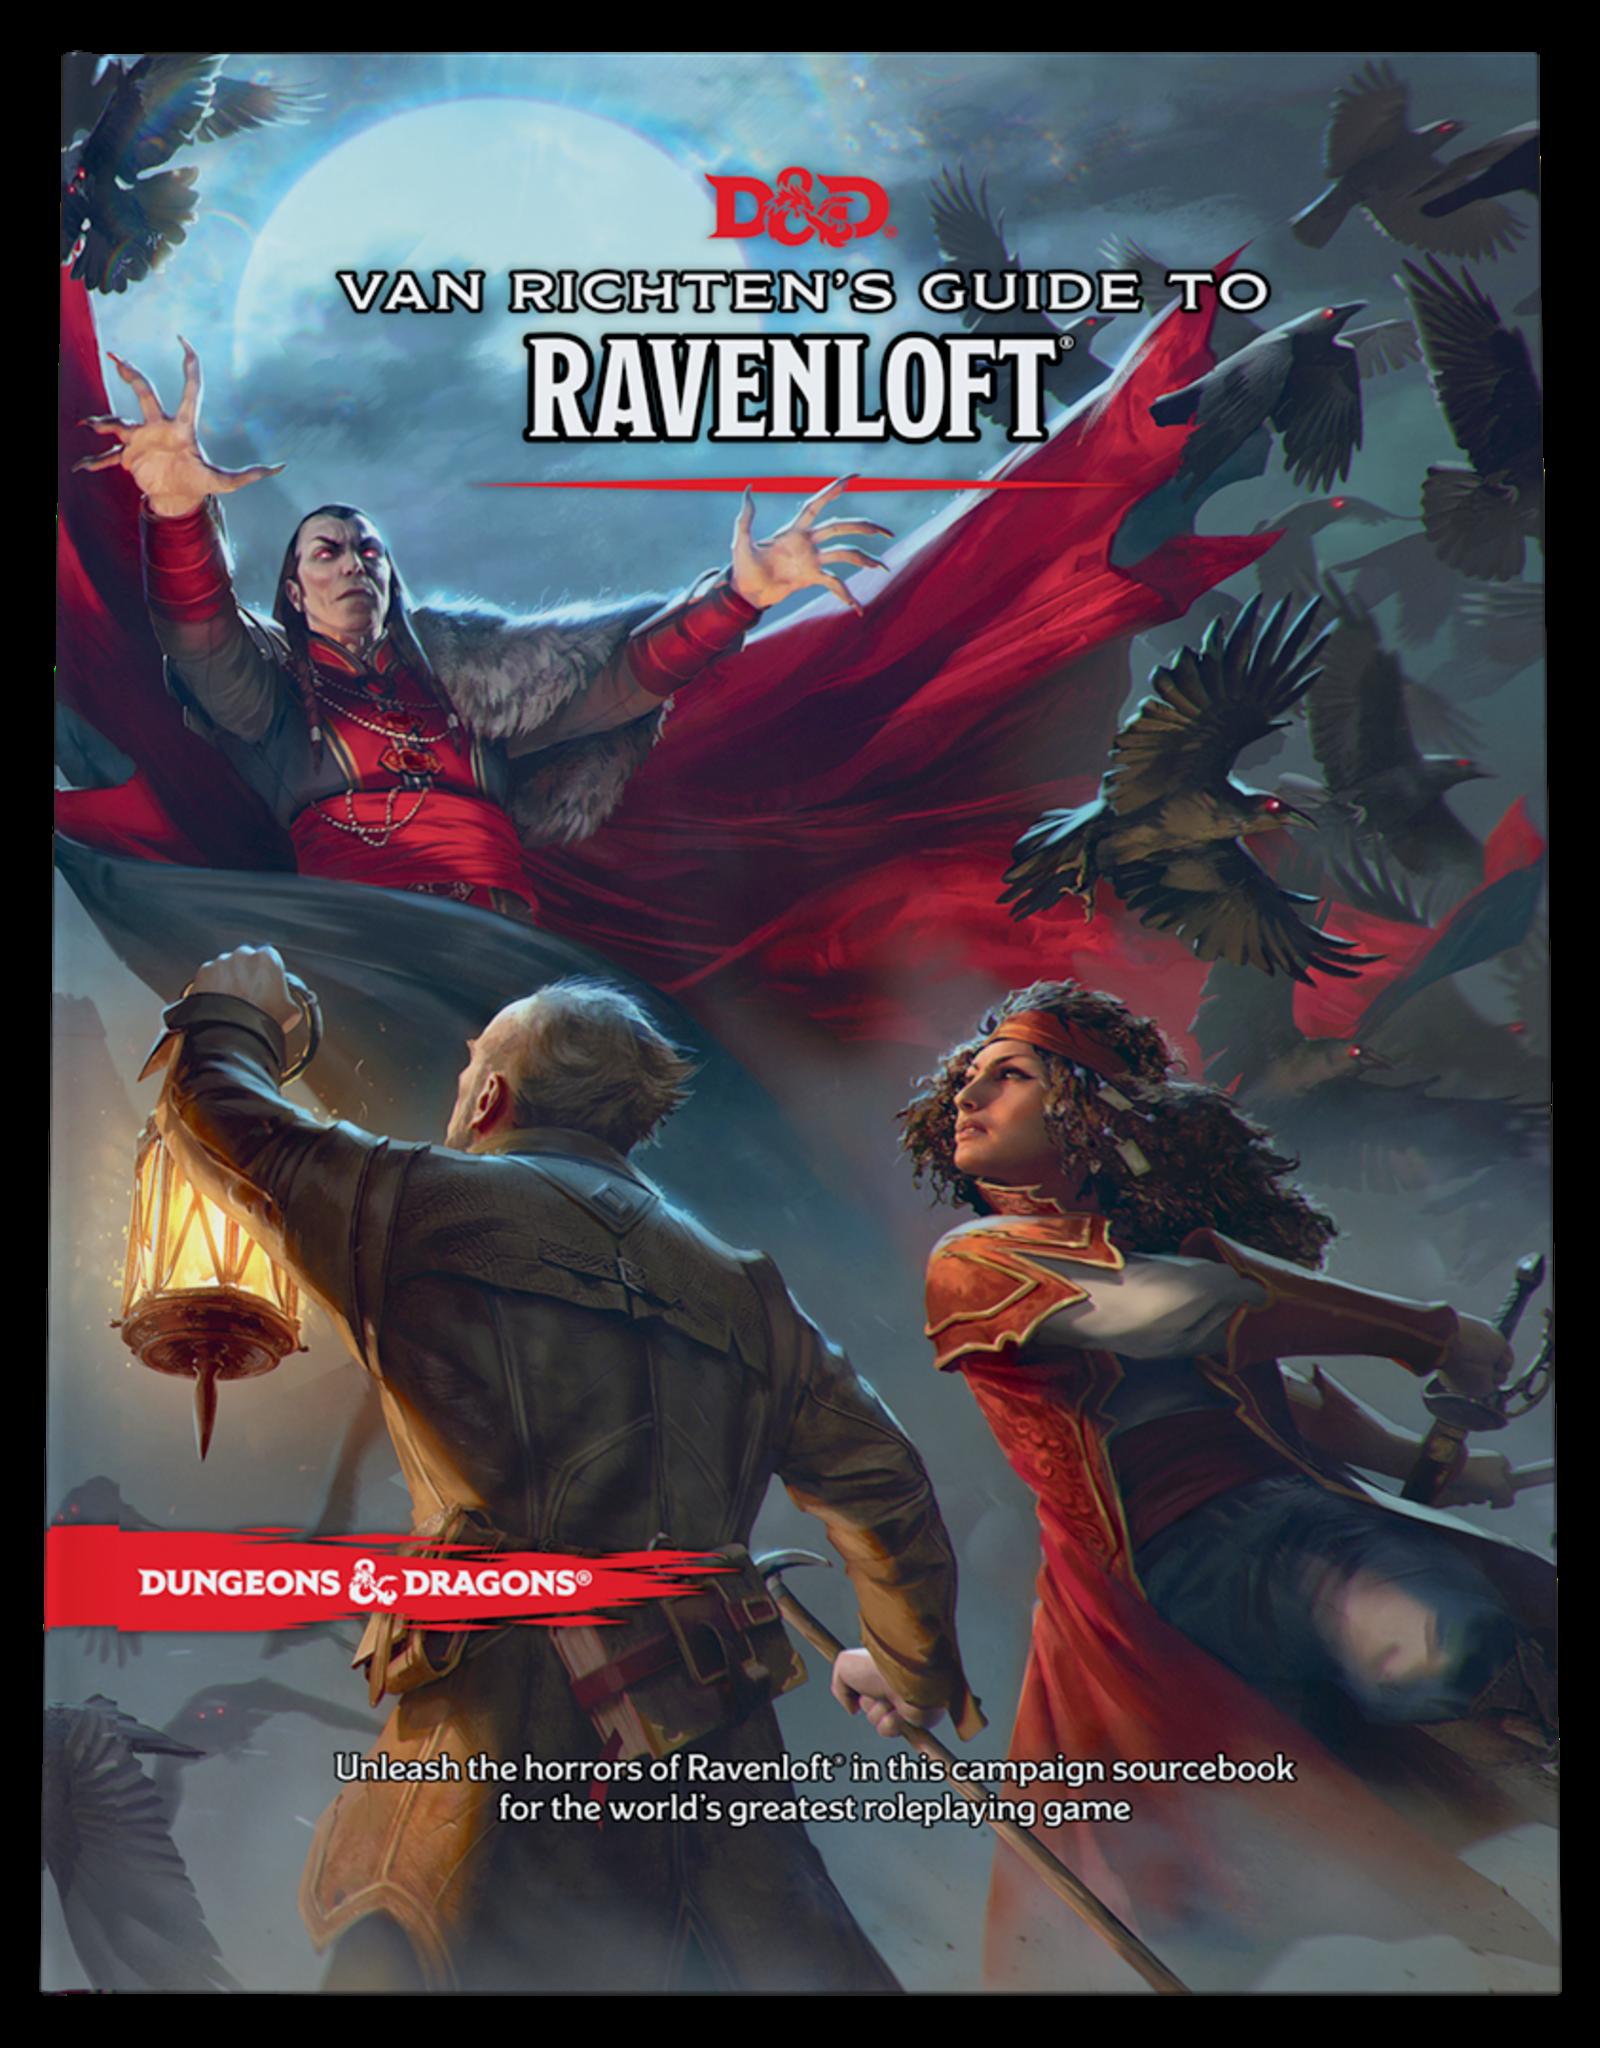 WOTC D&D 5th Ed: Van Richten's Guide to Ravenloft